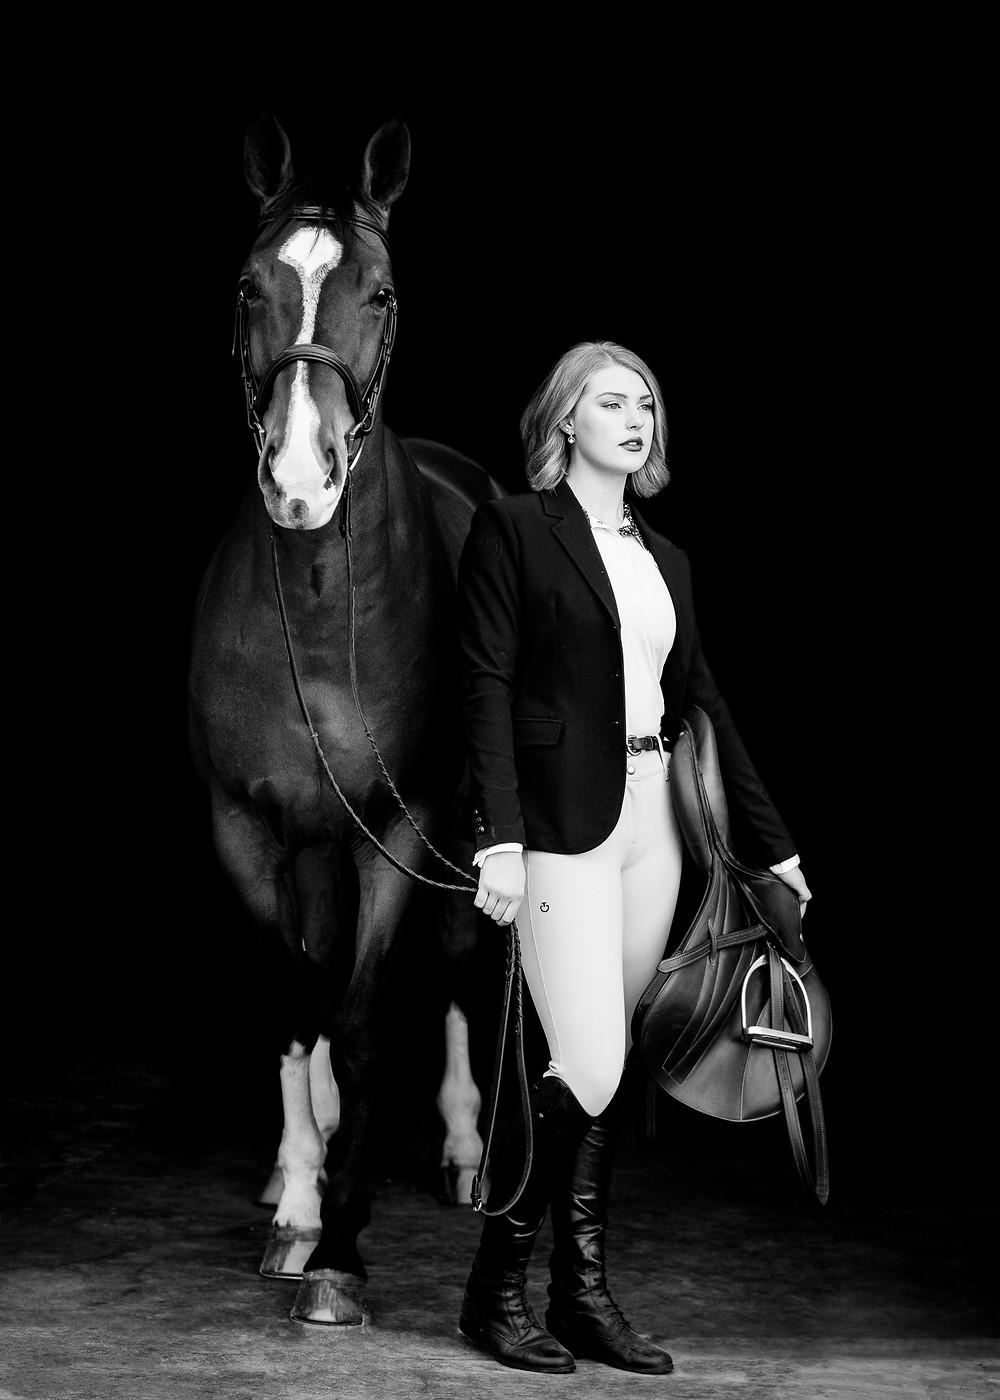 Siena & Kona on black background